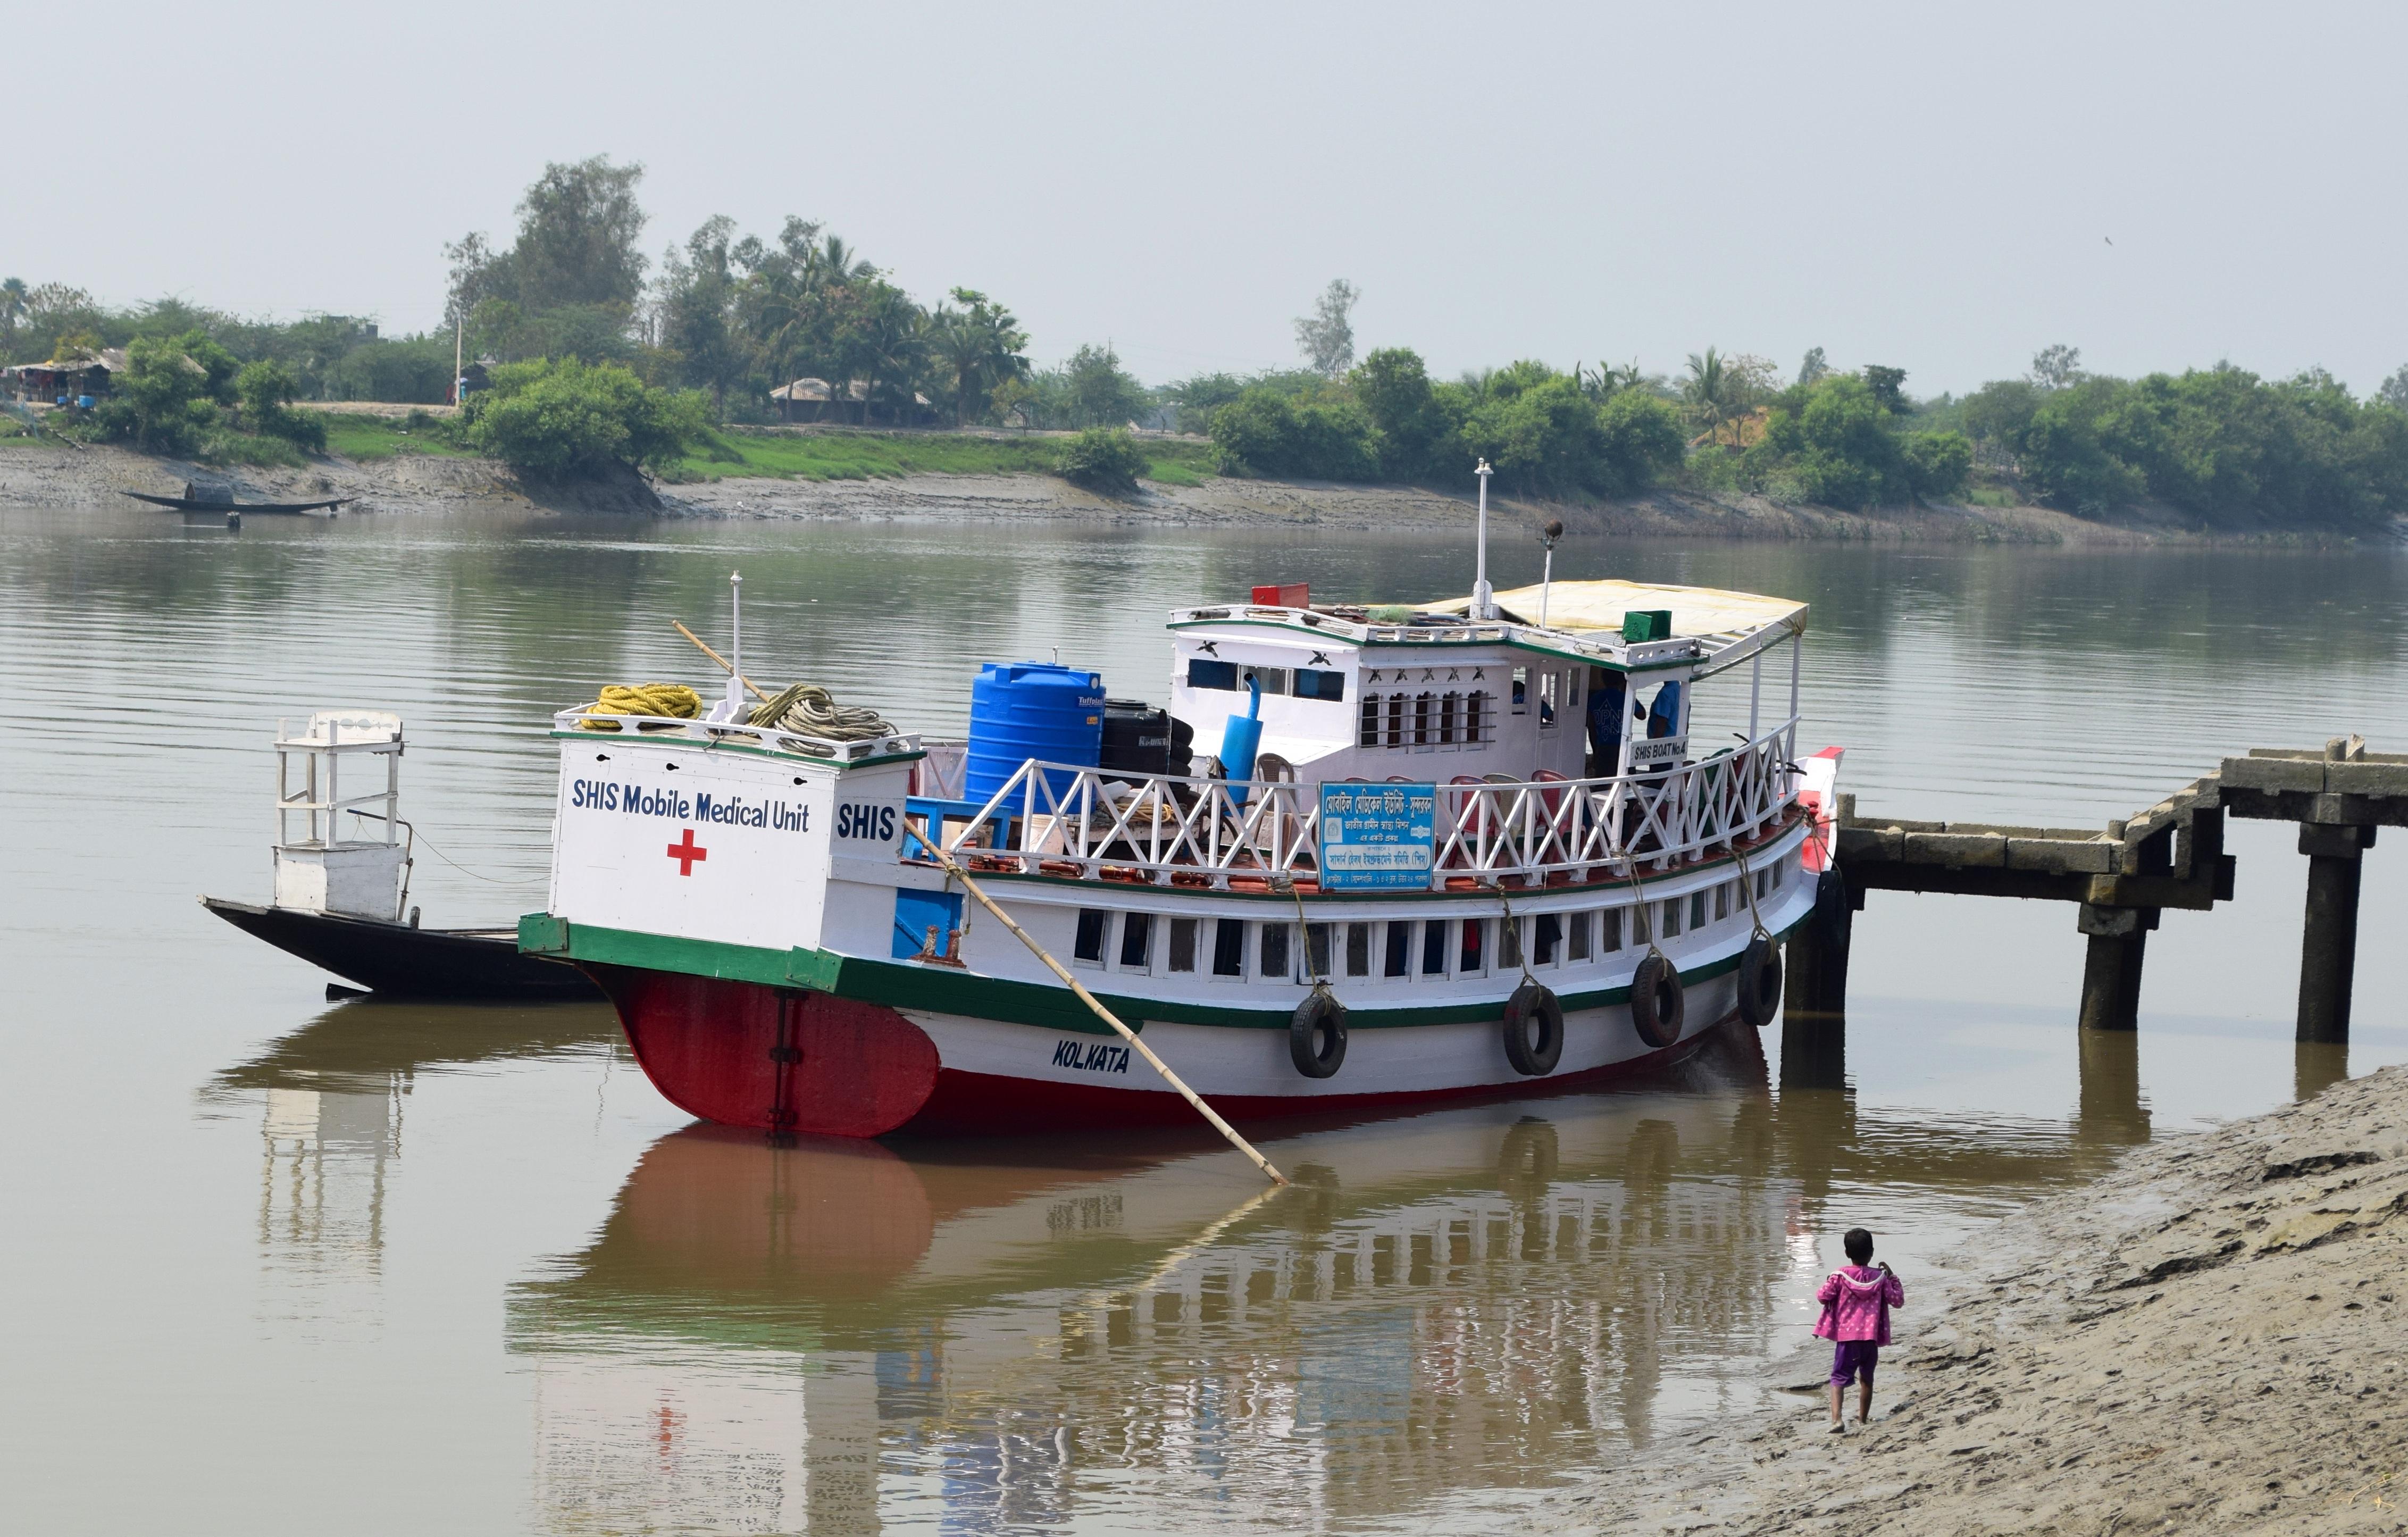 Proyecto del barco hospital en el delta del Ganges